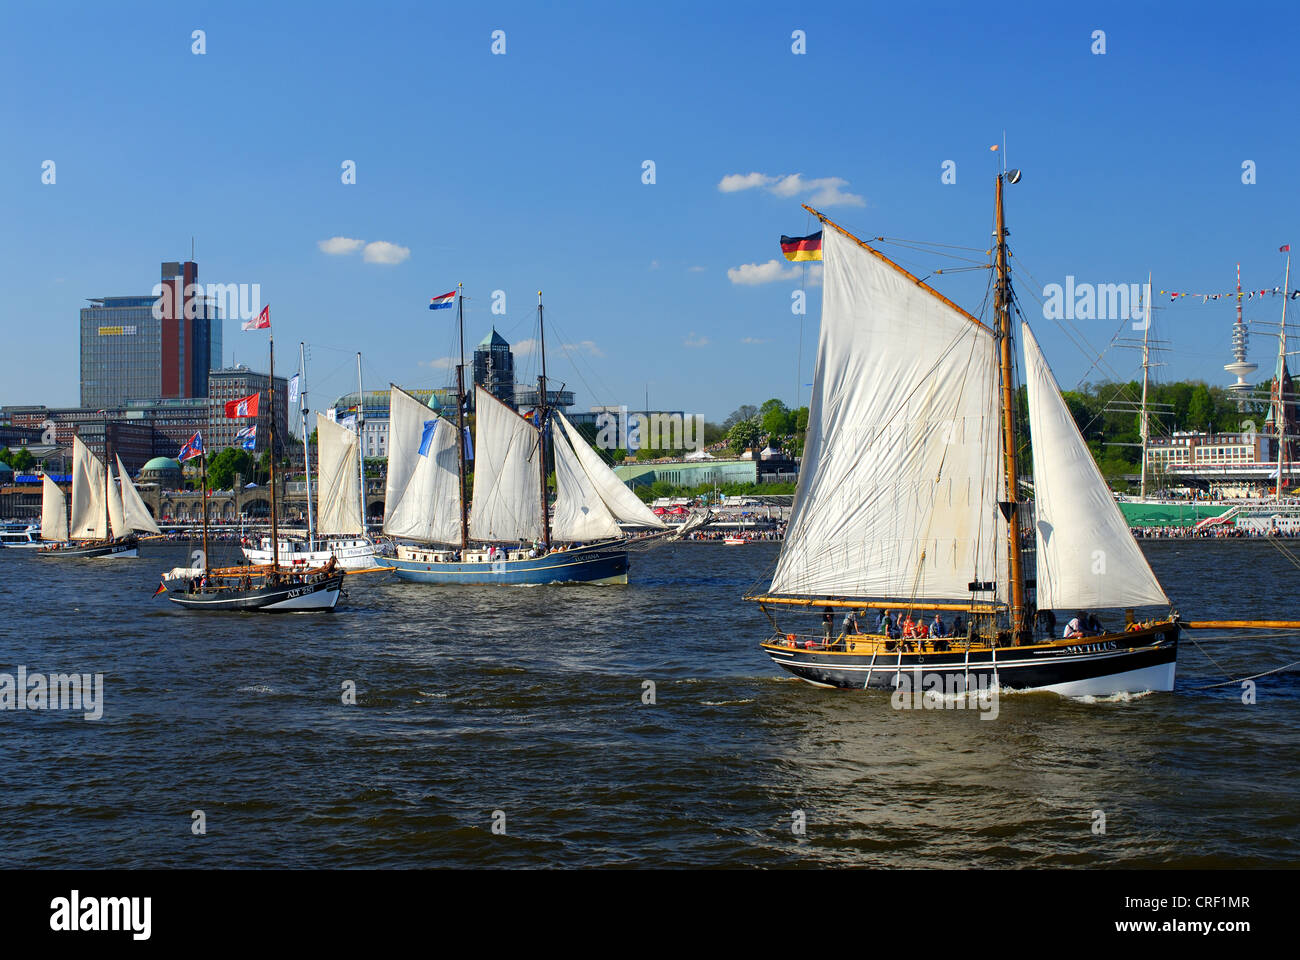 birthday of Port of Hamburg, sailboats in front of the City, Germany, Hamburg - Stock Image